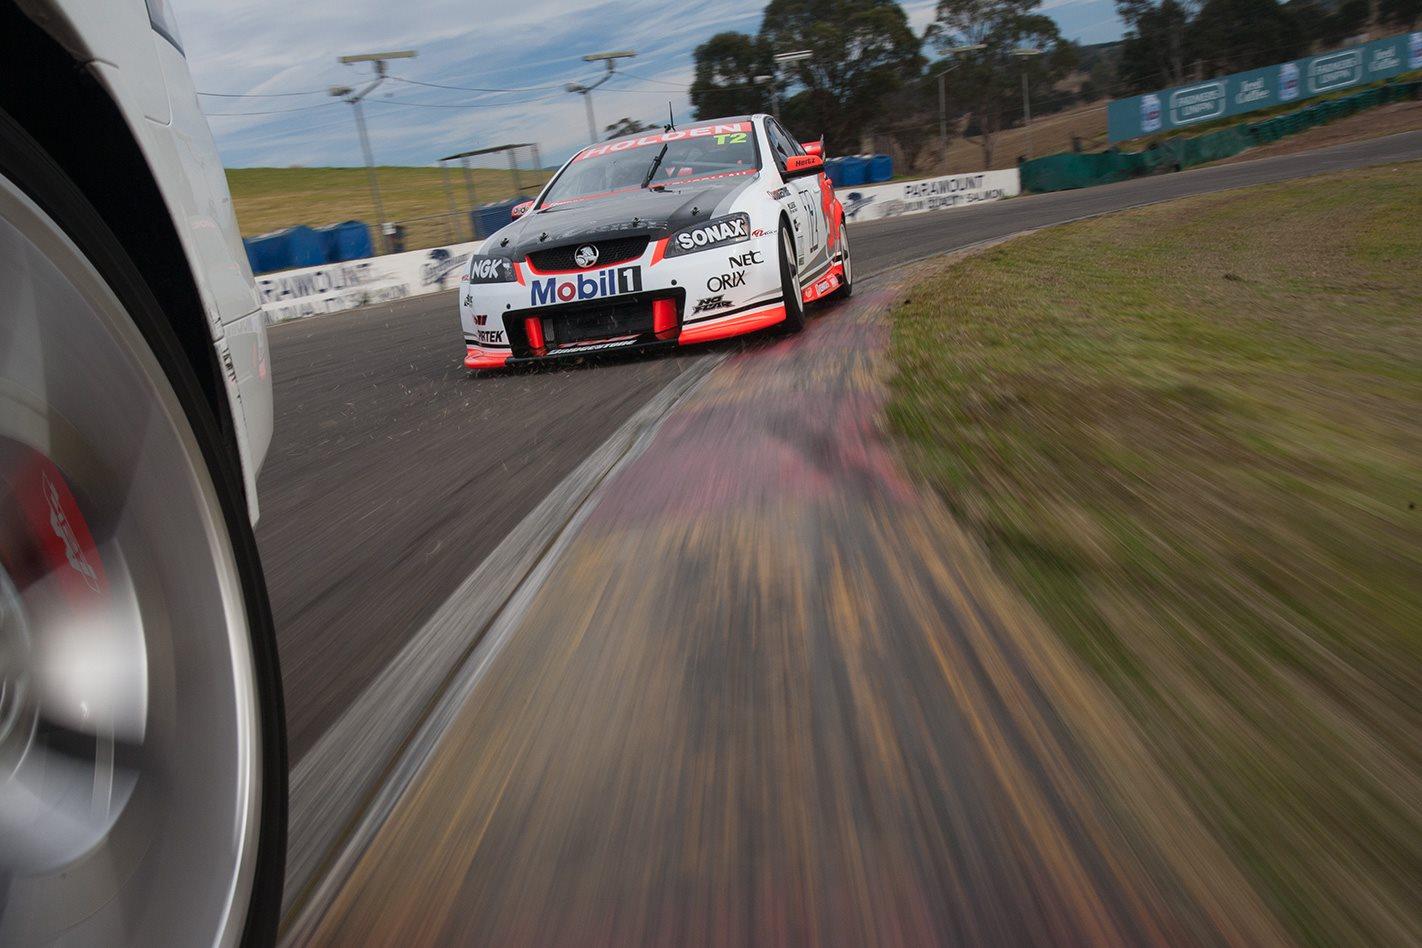 HSV-V8-Supercar-front.jpg